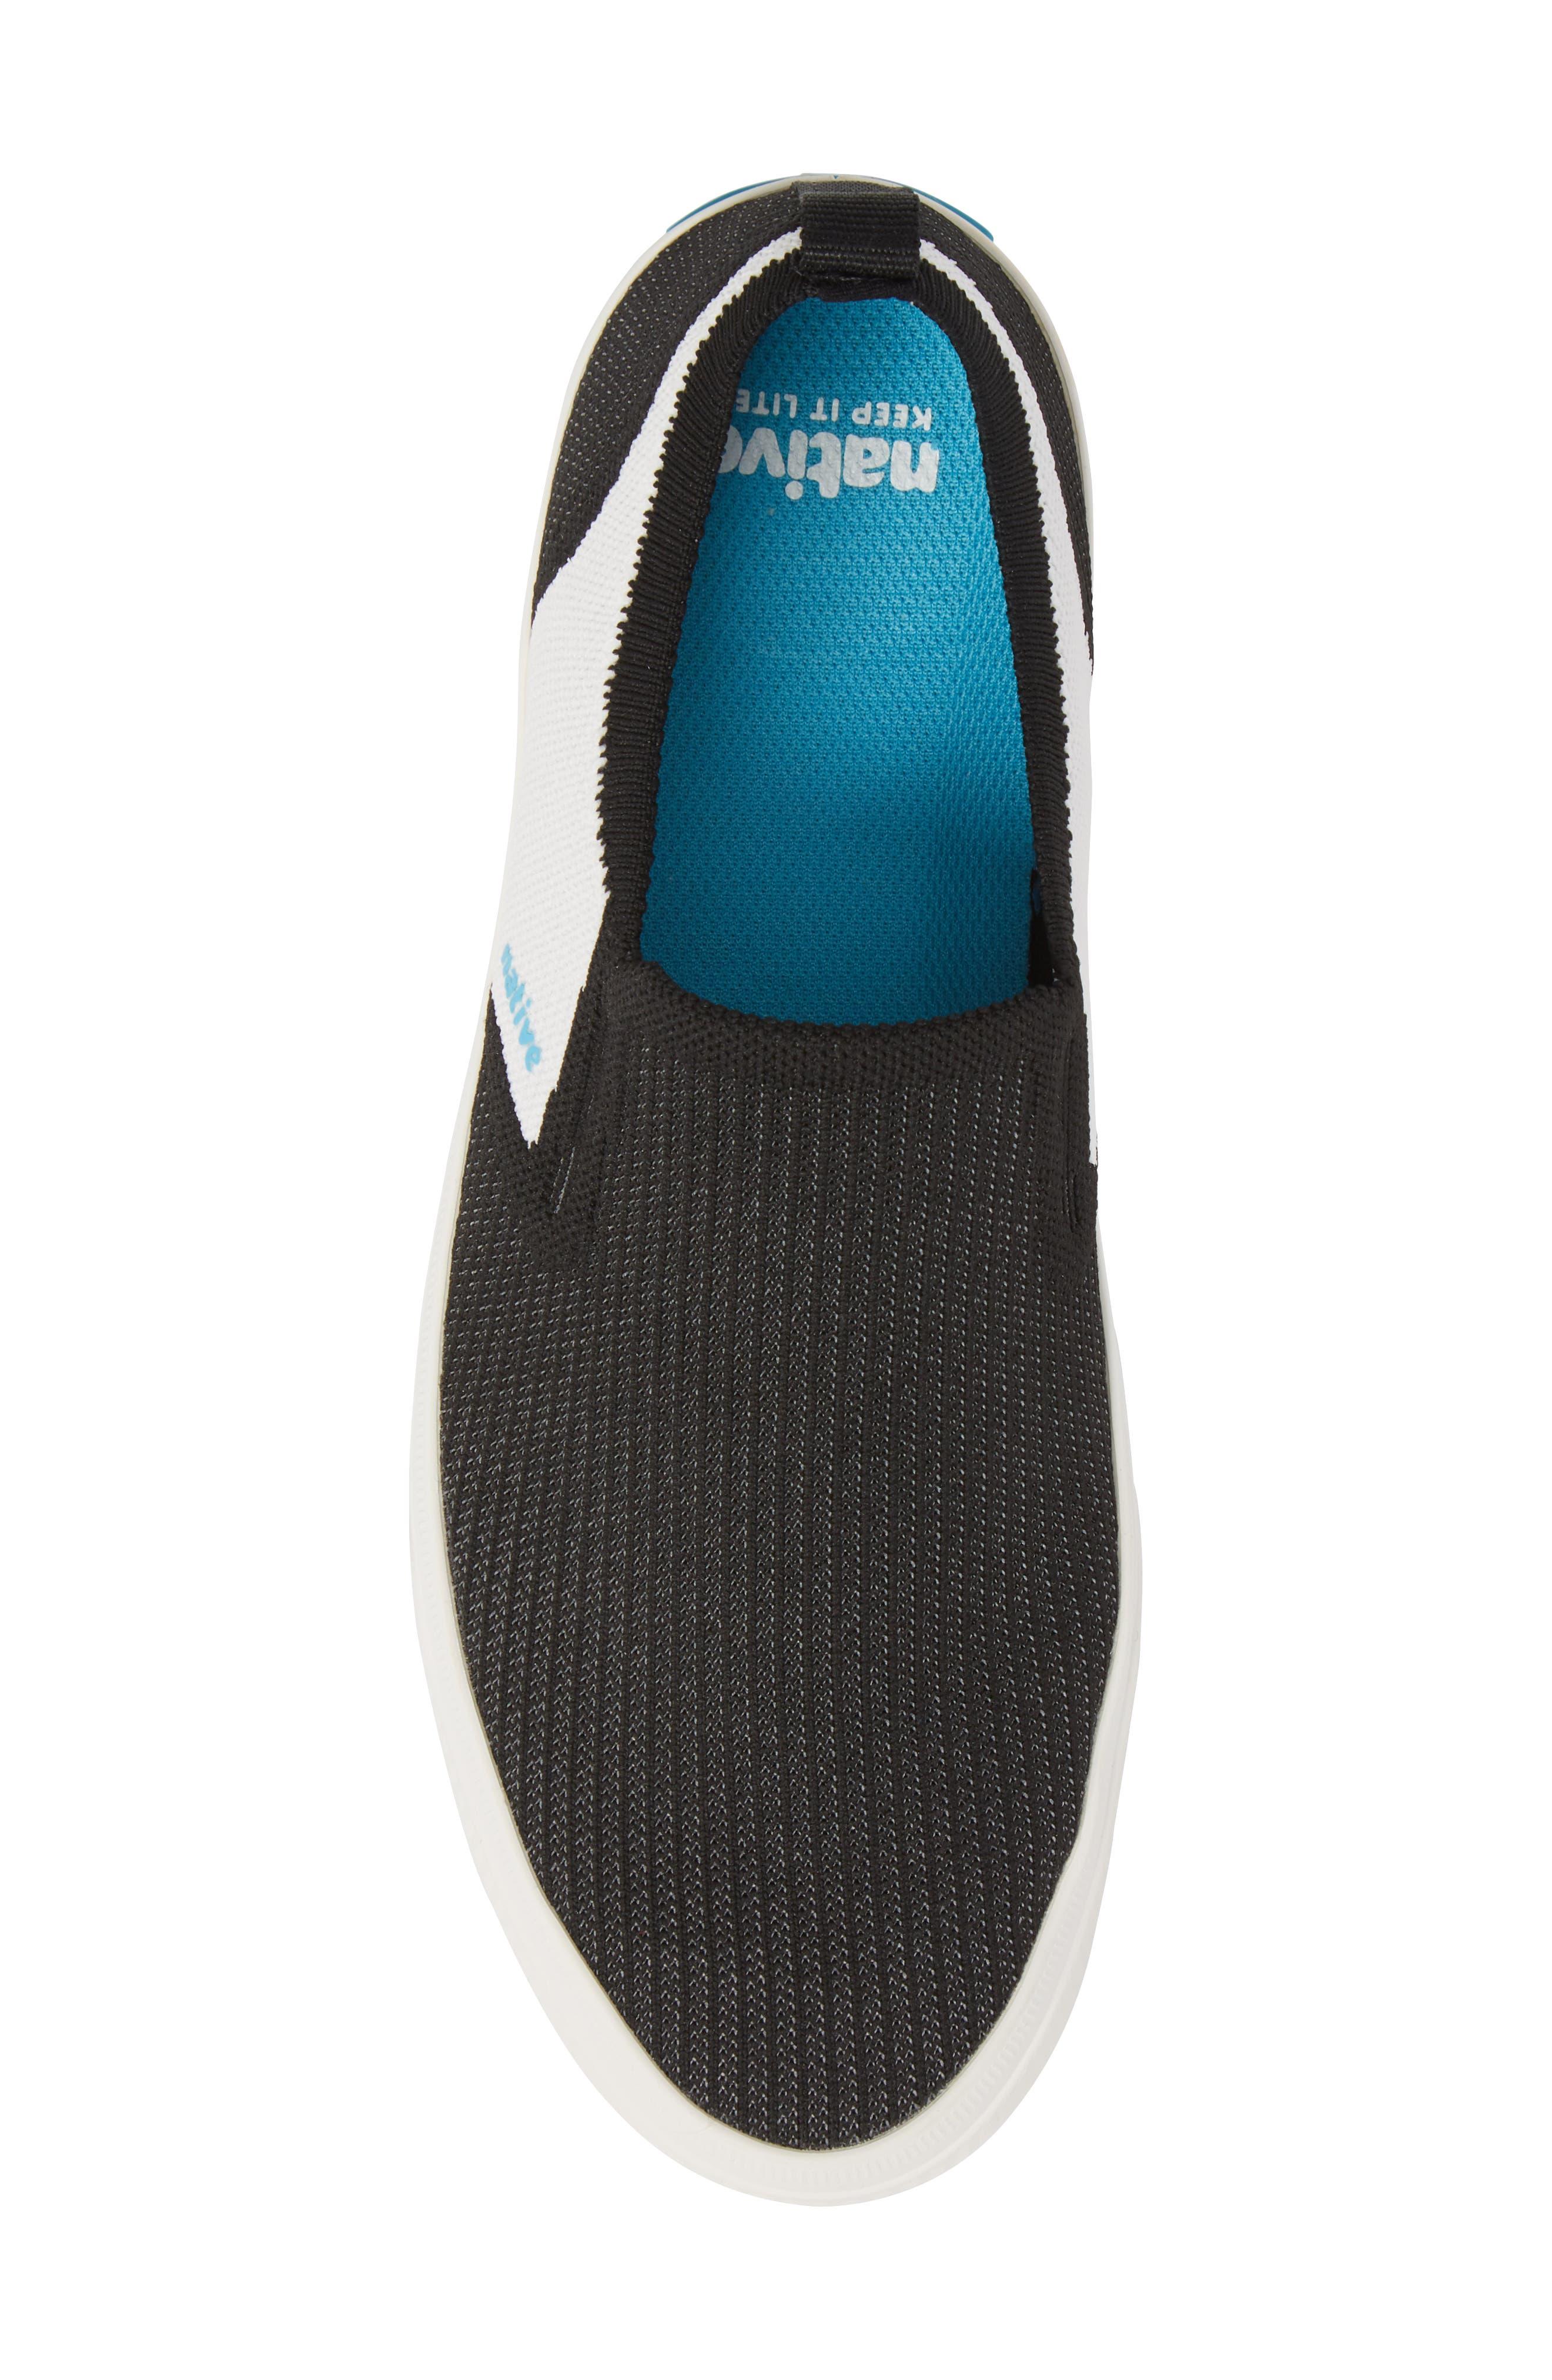 Native Miles LiteKnit Slip-On Sneaker,                             Alternate thumbnail 5, color,                             Jiffy Black/ Shell White